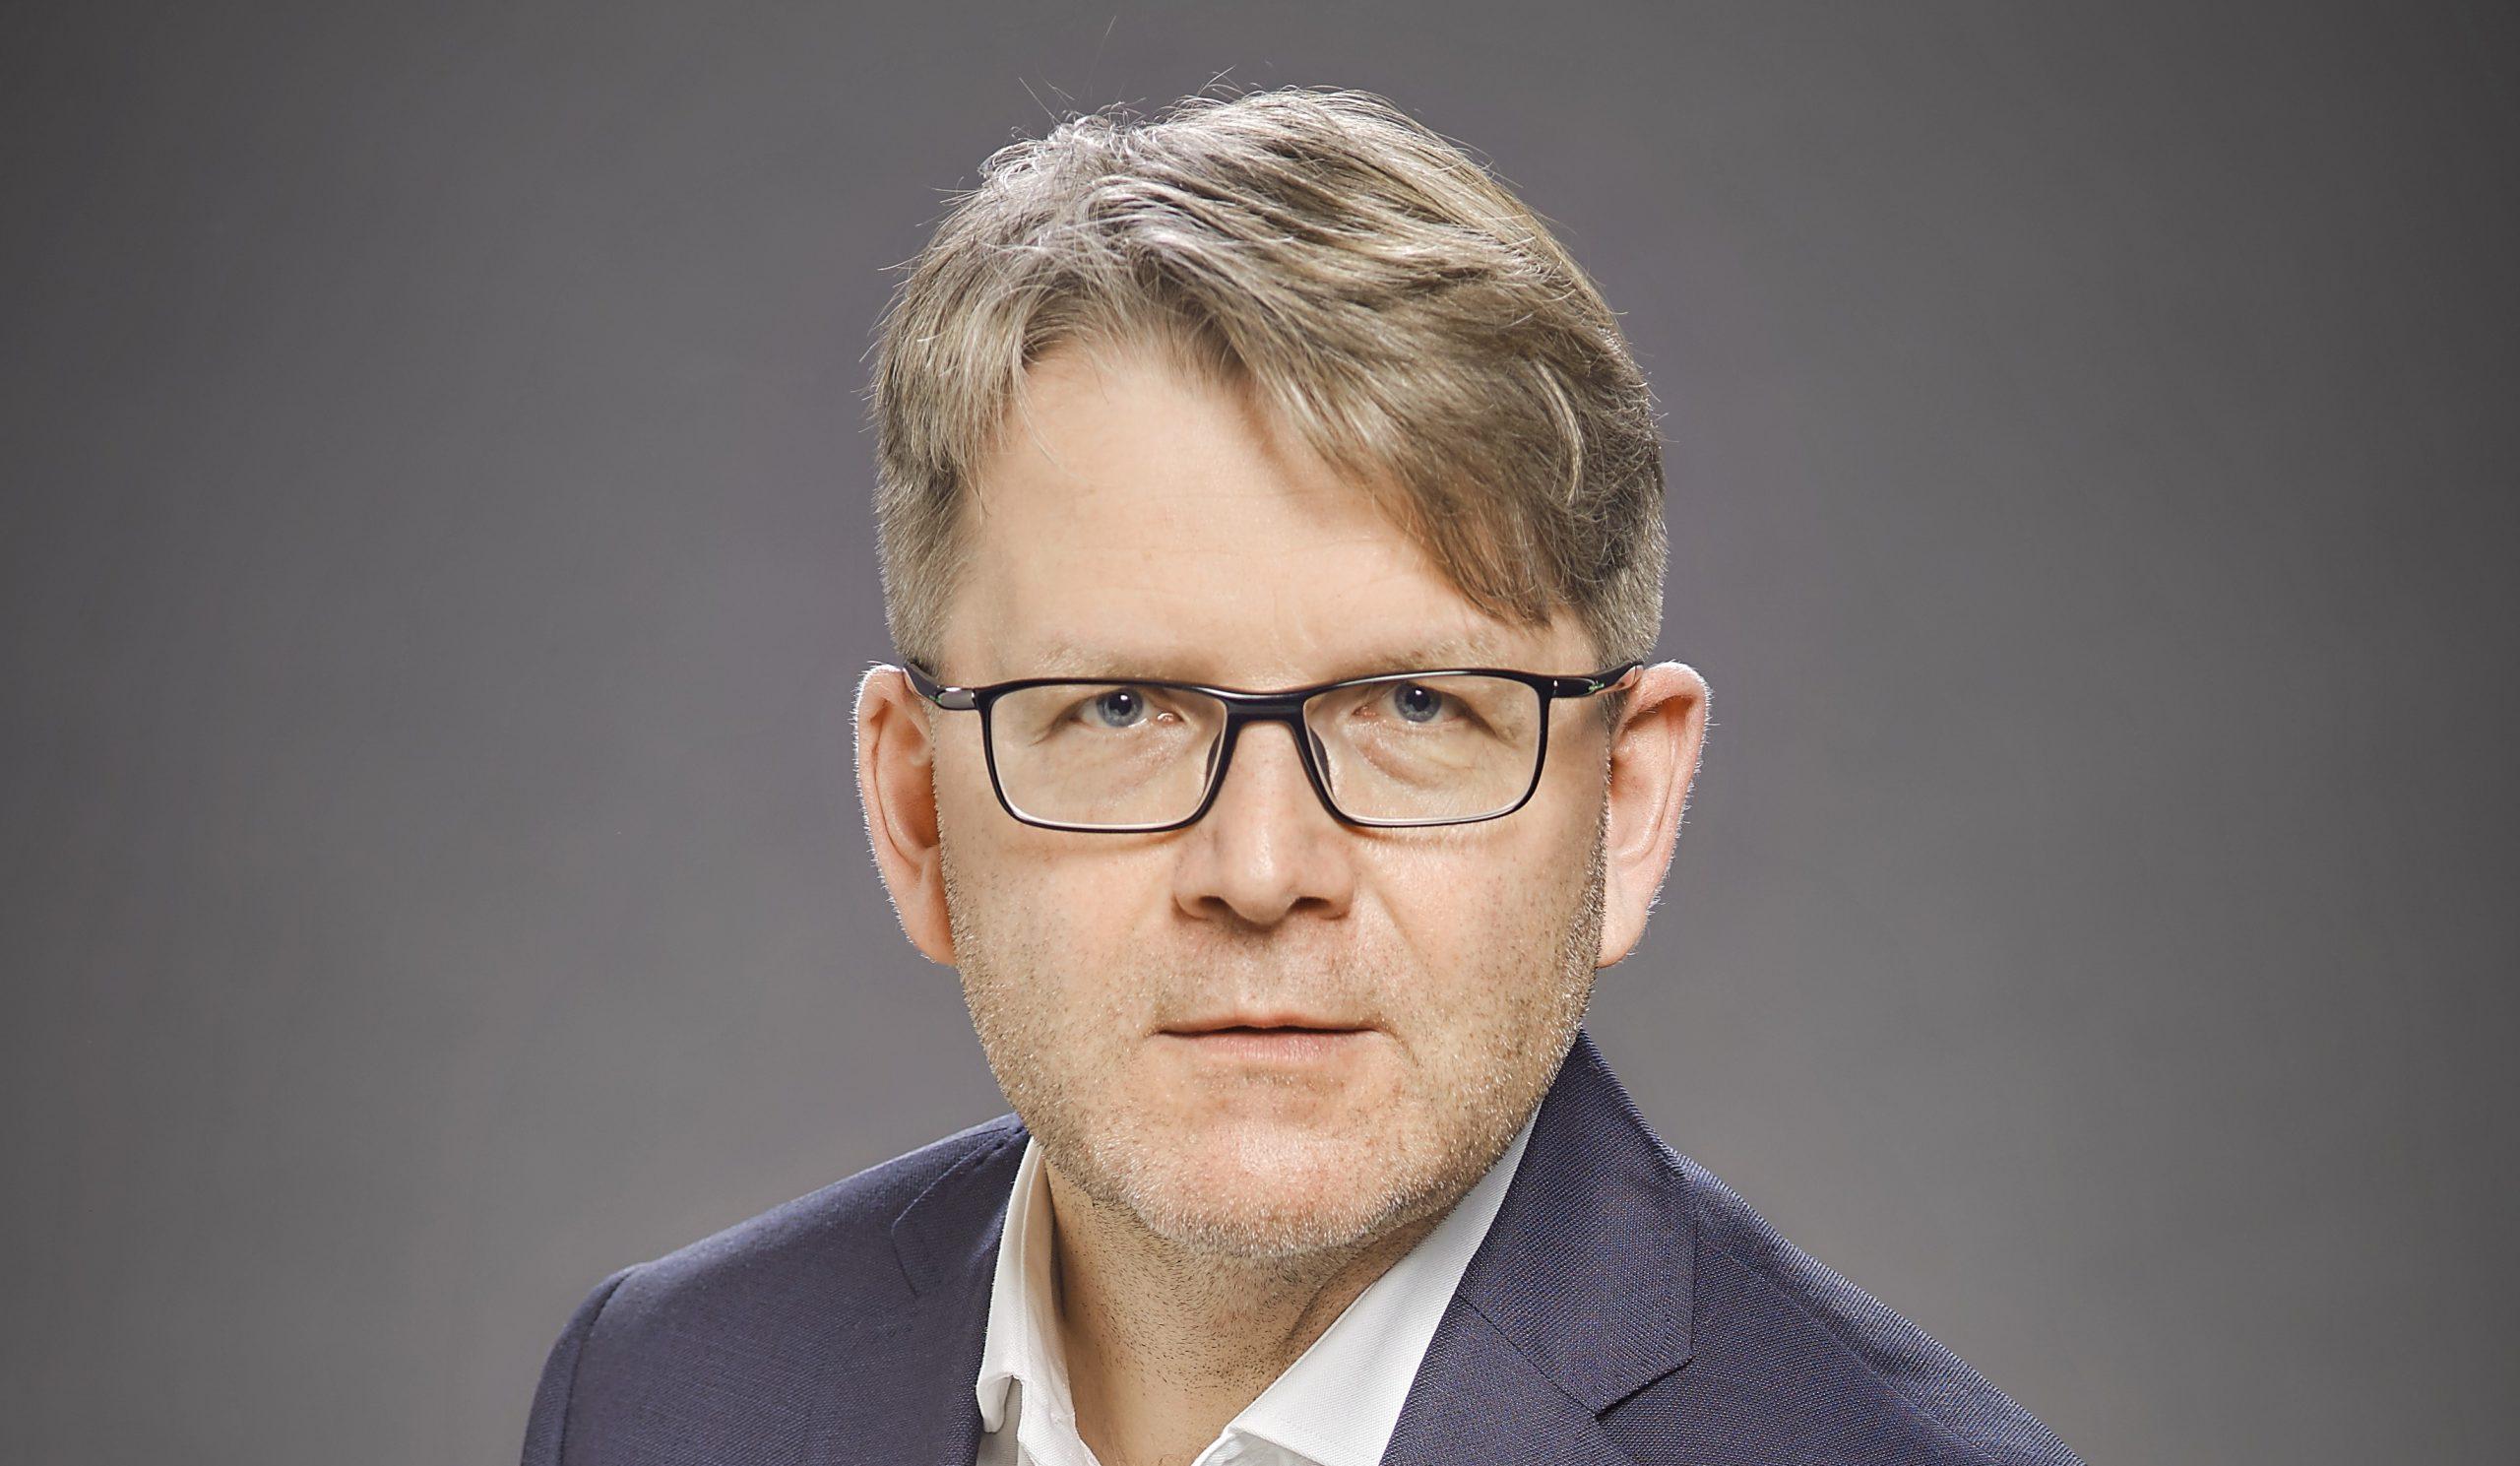 Andrzej Skowroński, Dyrektor Imperial Tobacco Polska